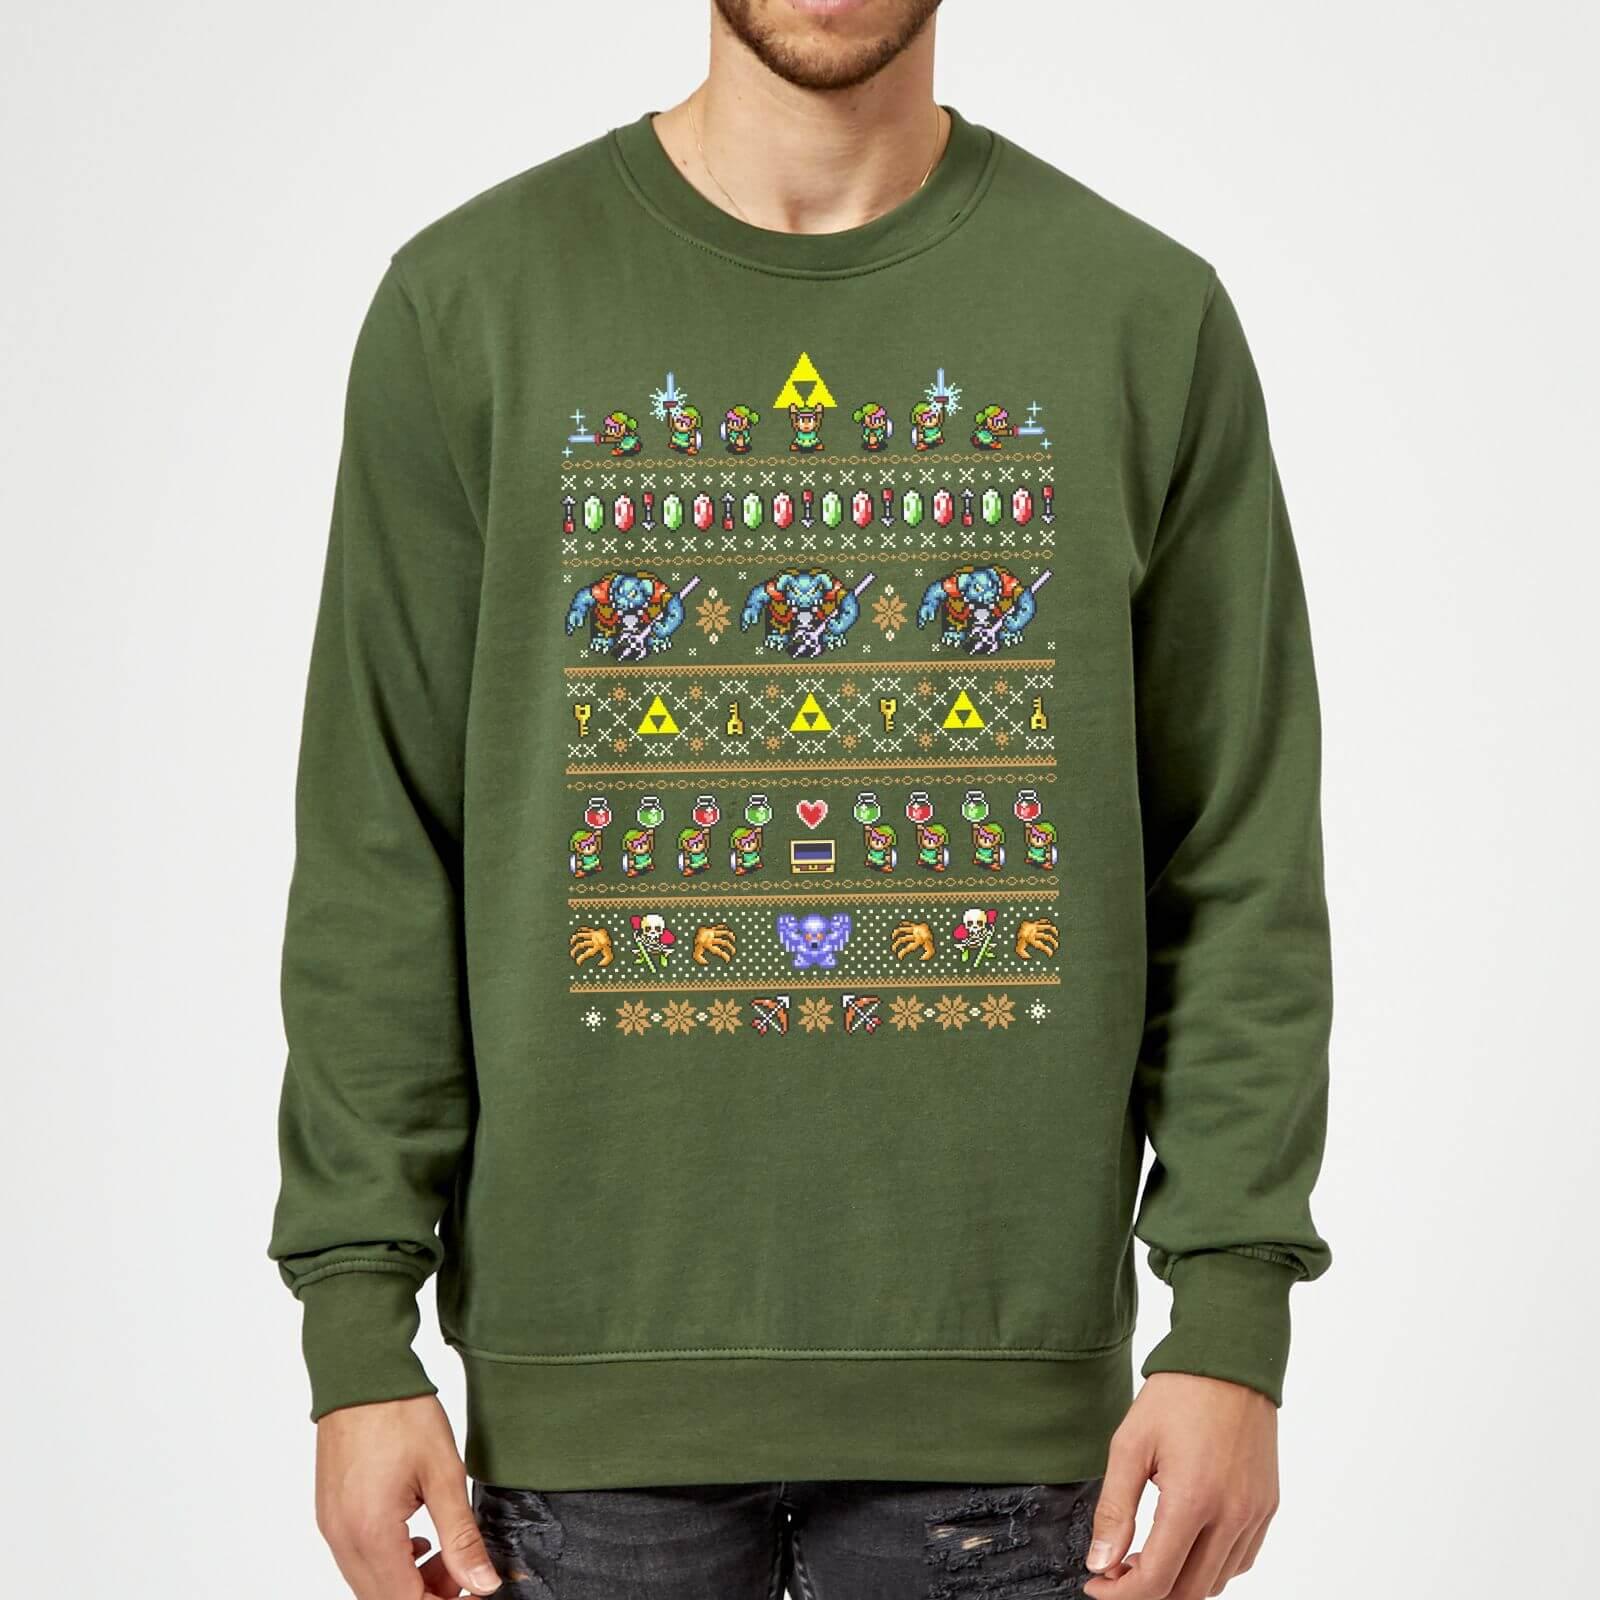 Nintendo The Legend Of Zelda Retro Green Christmas Sweatshirt - L - Green